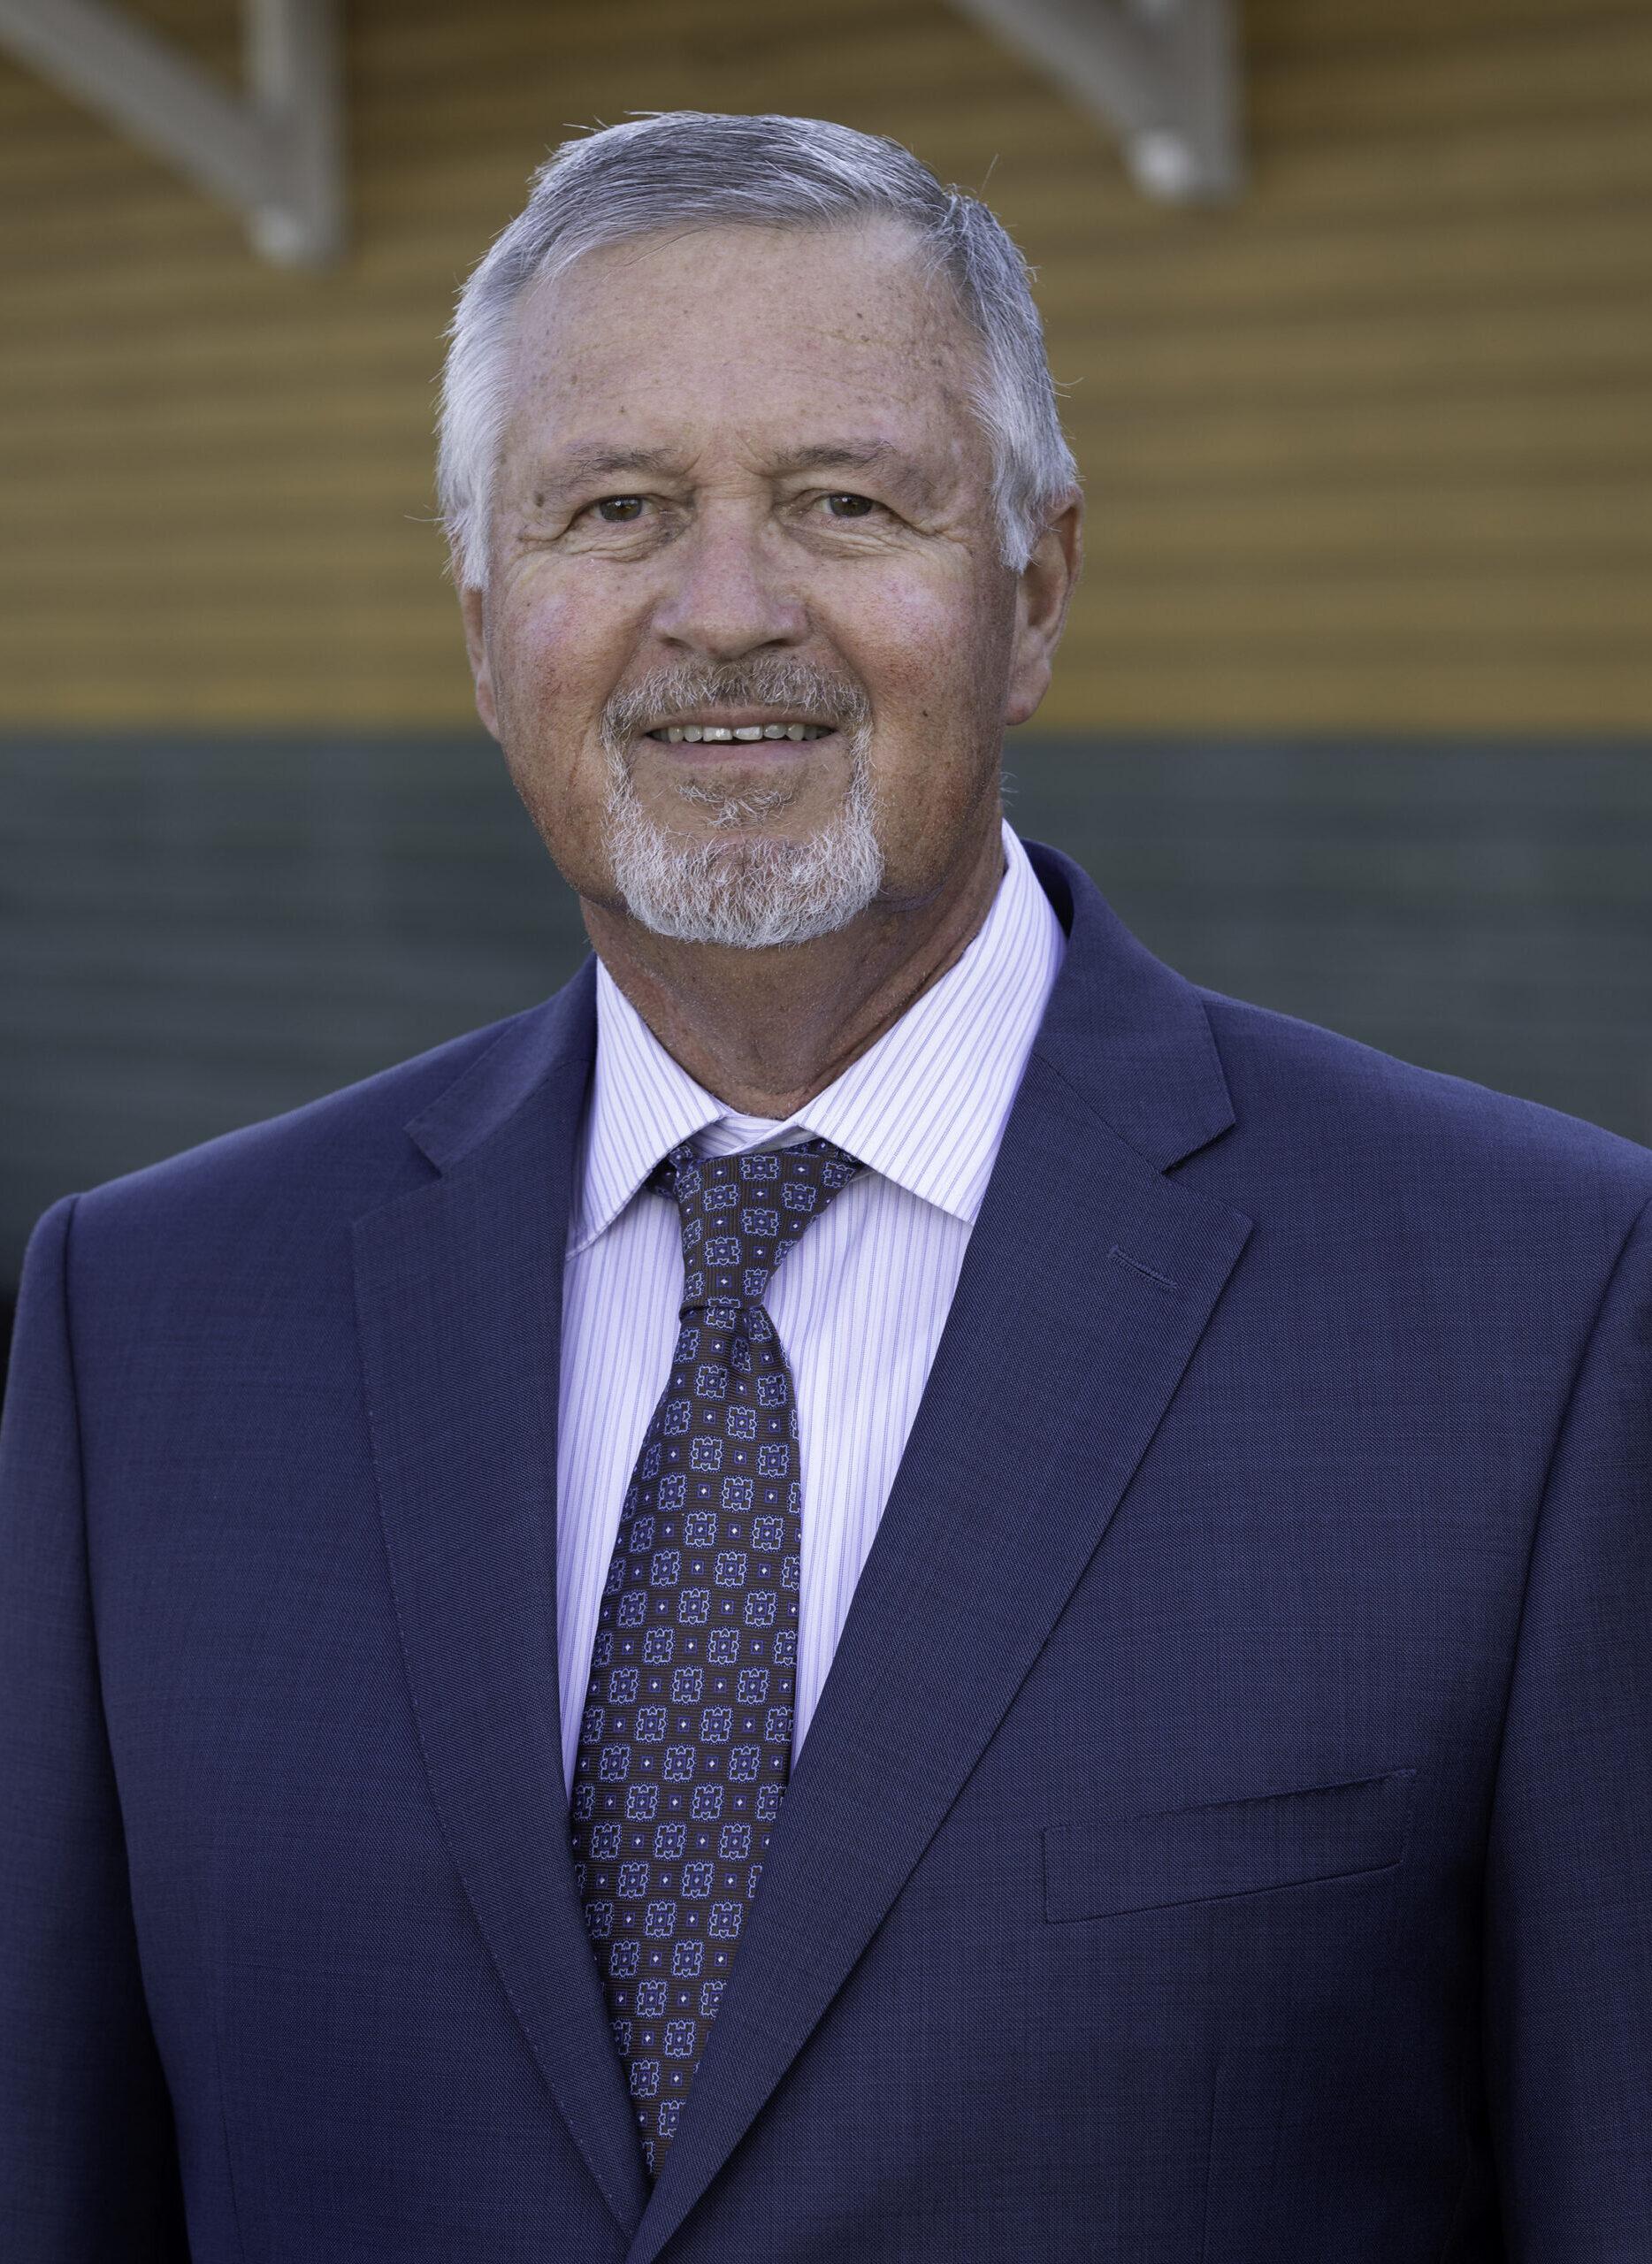 Bill Viox : Professional Civil Engineer, Principal & Vice President